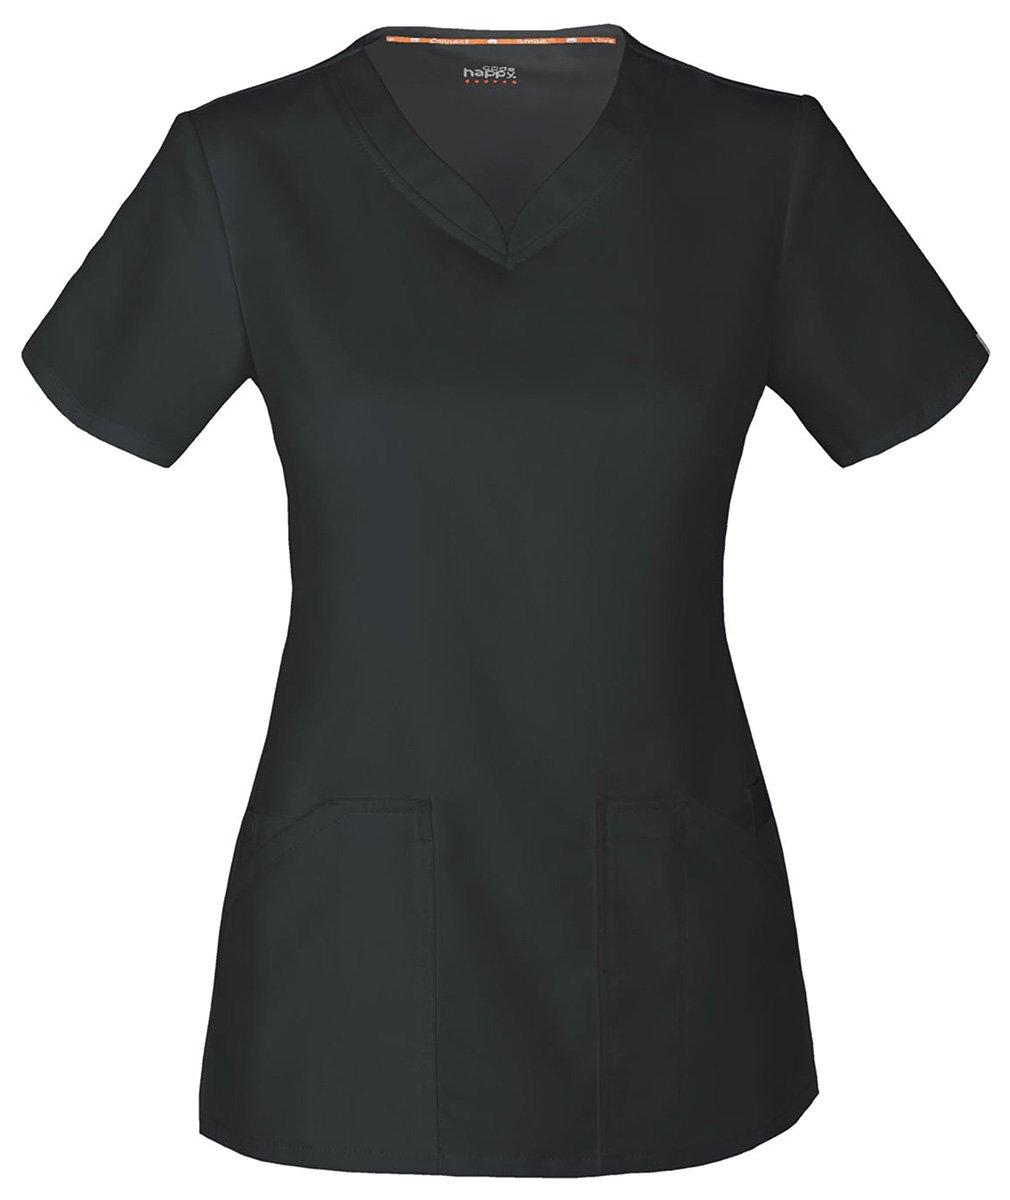 Code Happy Women's Cloud Nine V-Neck Top, Black, 4X-Large